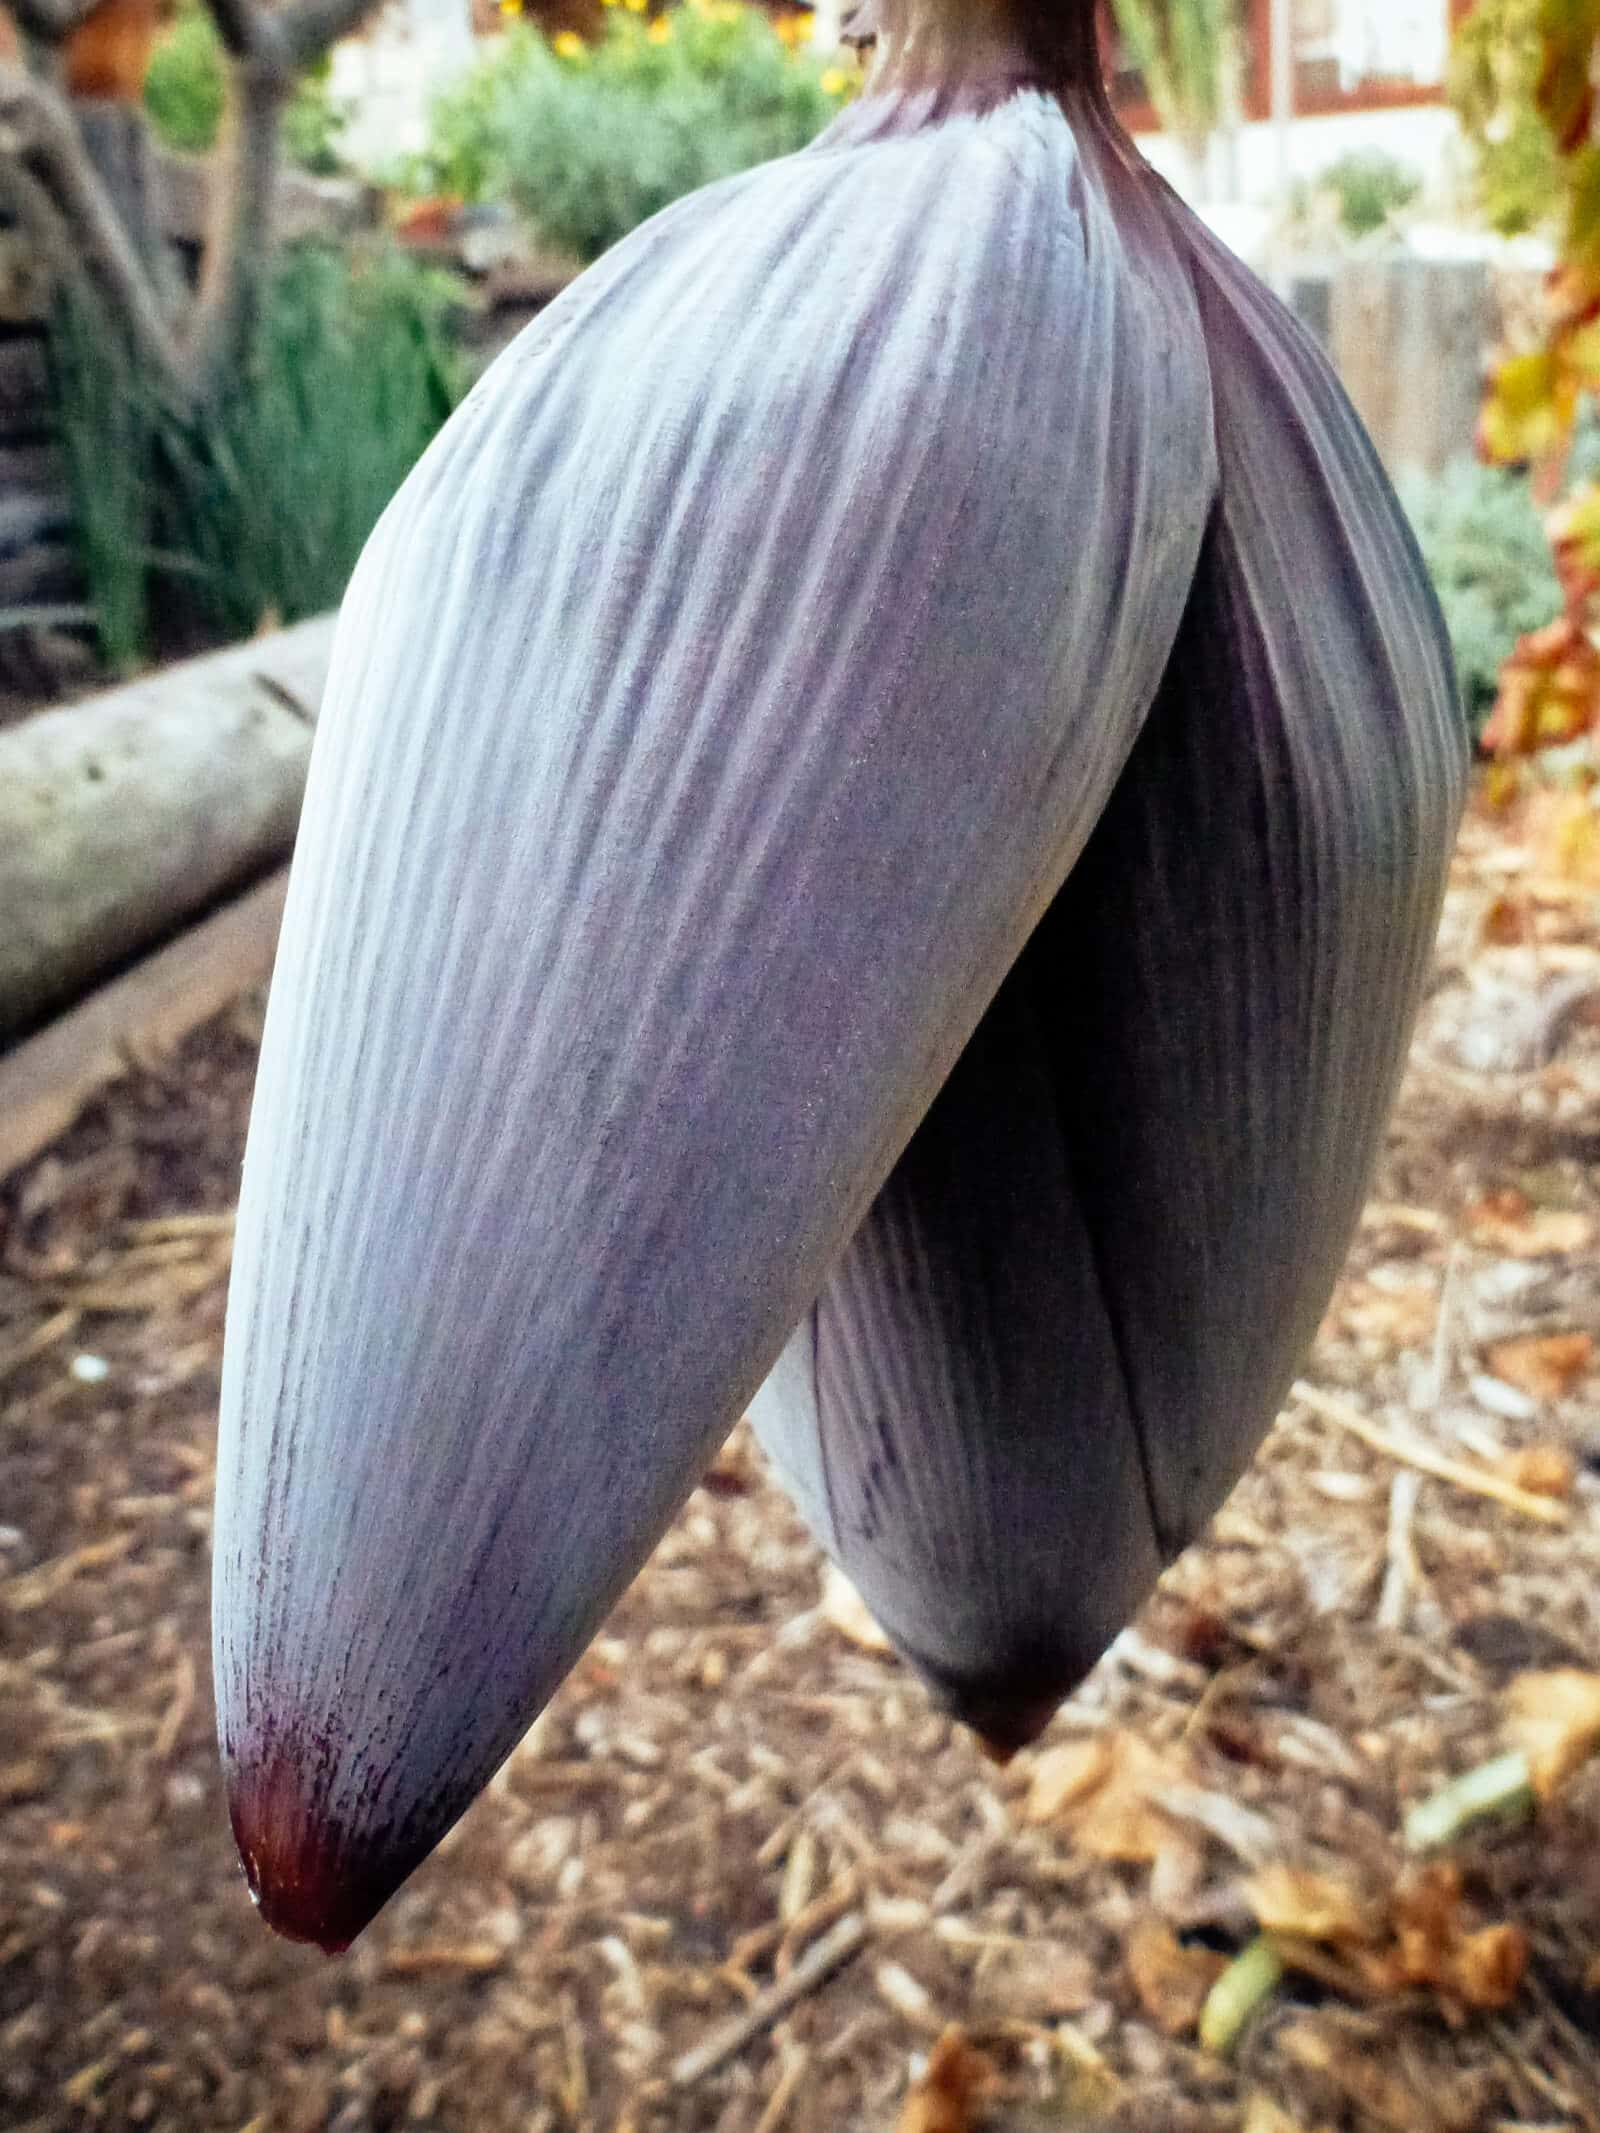 Deep purple inflorescence (bud) on a banana plant, also called a banana heart